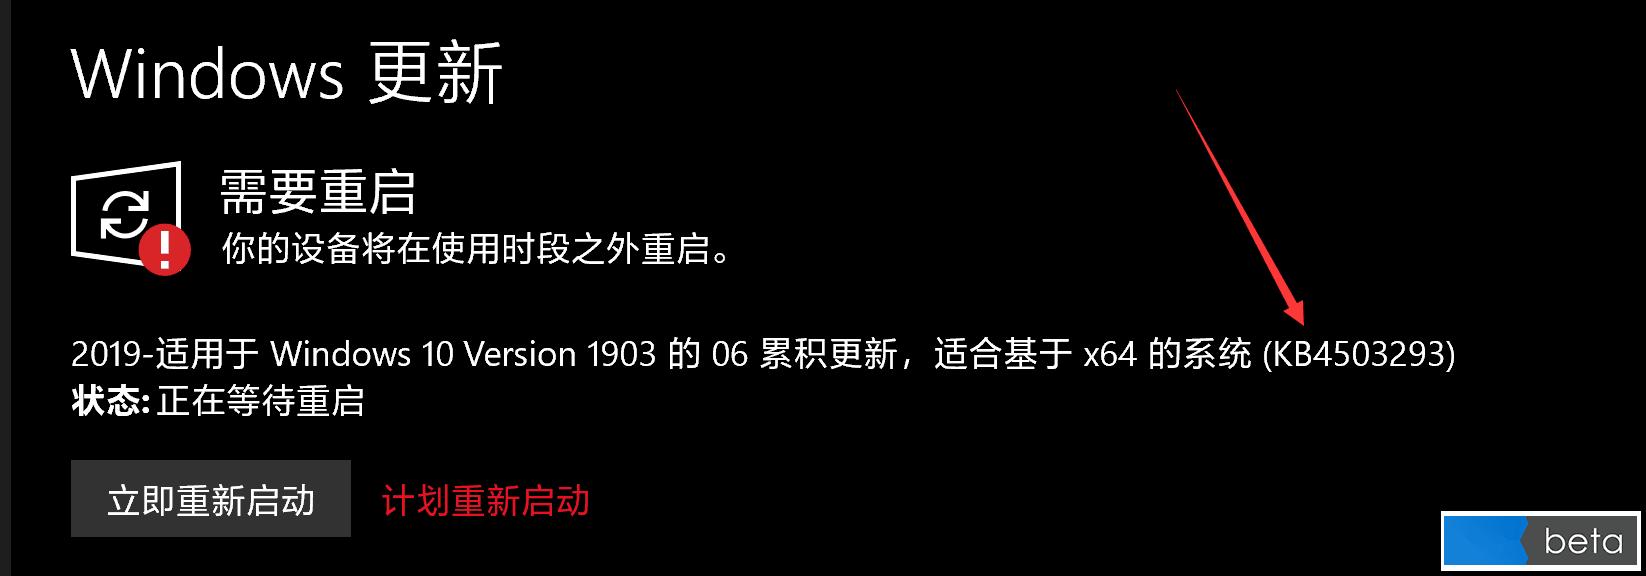 QQ图片20190612080801.png